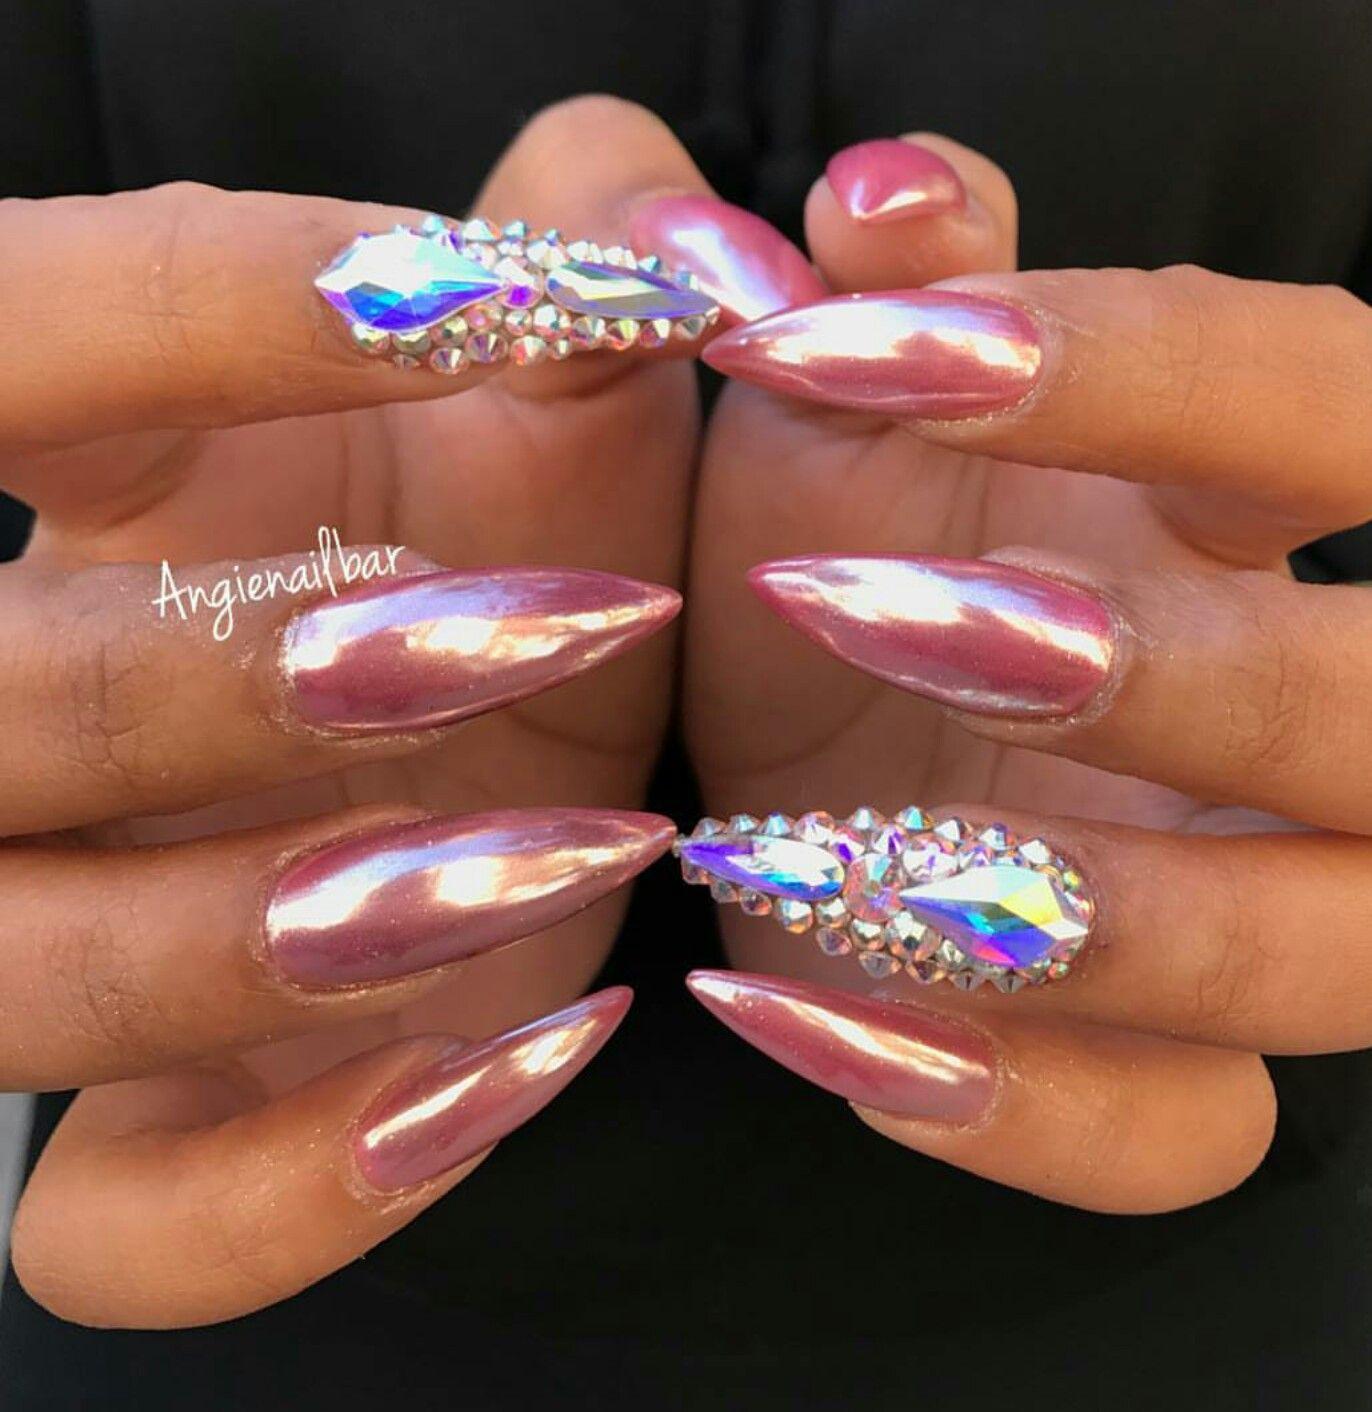 Pin by natasha flowers on beauty pinterest